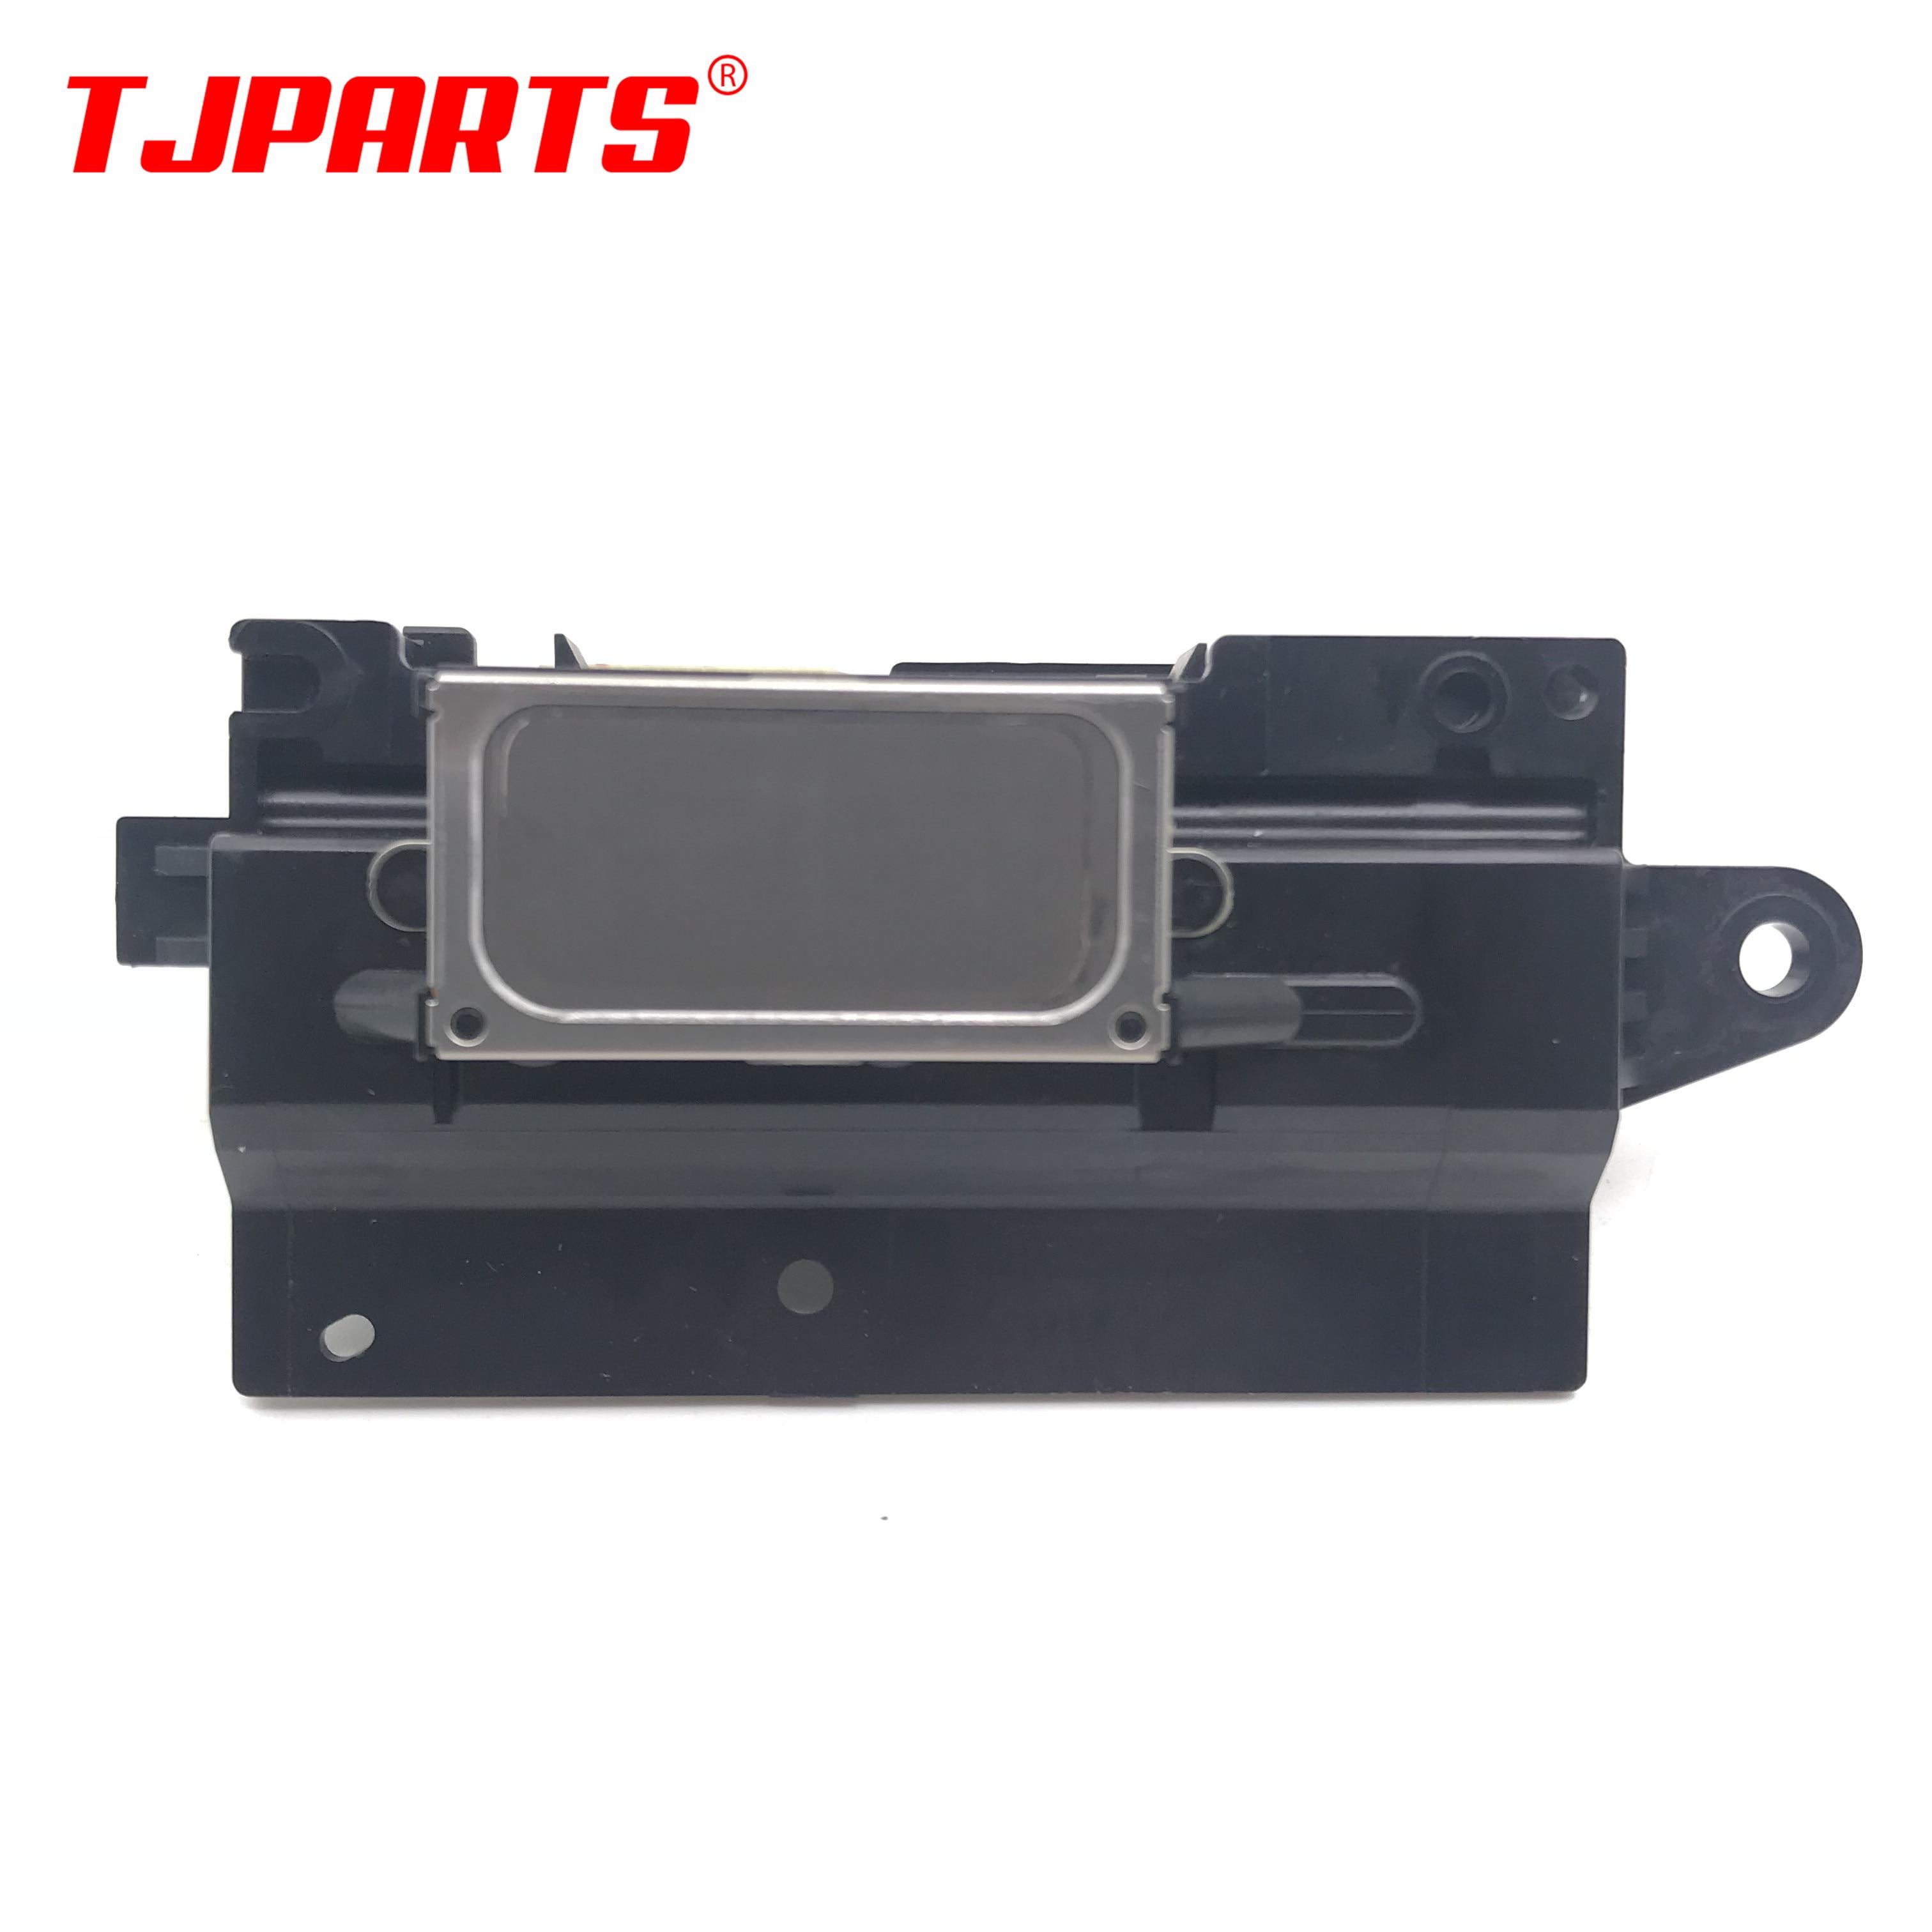 F083000 F083030 Printhead Printer Print Head For Epson Stylus Photo 790 890 895 1290 1290S 915 900 880